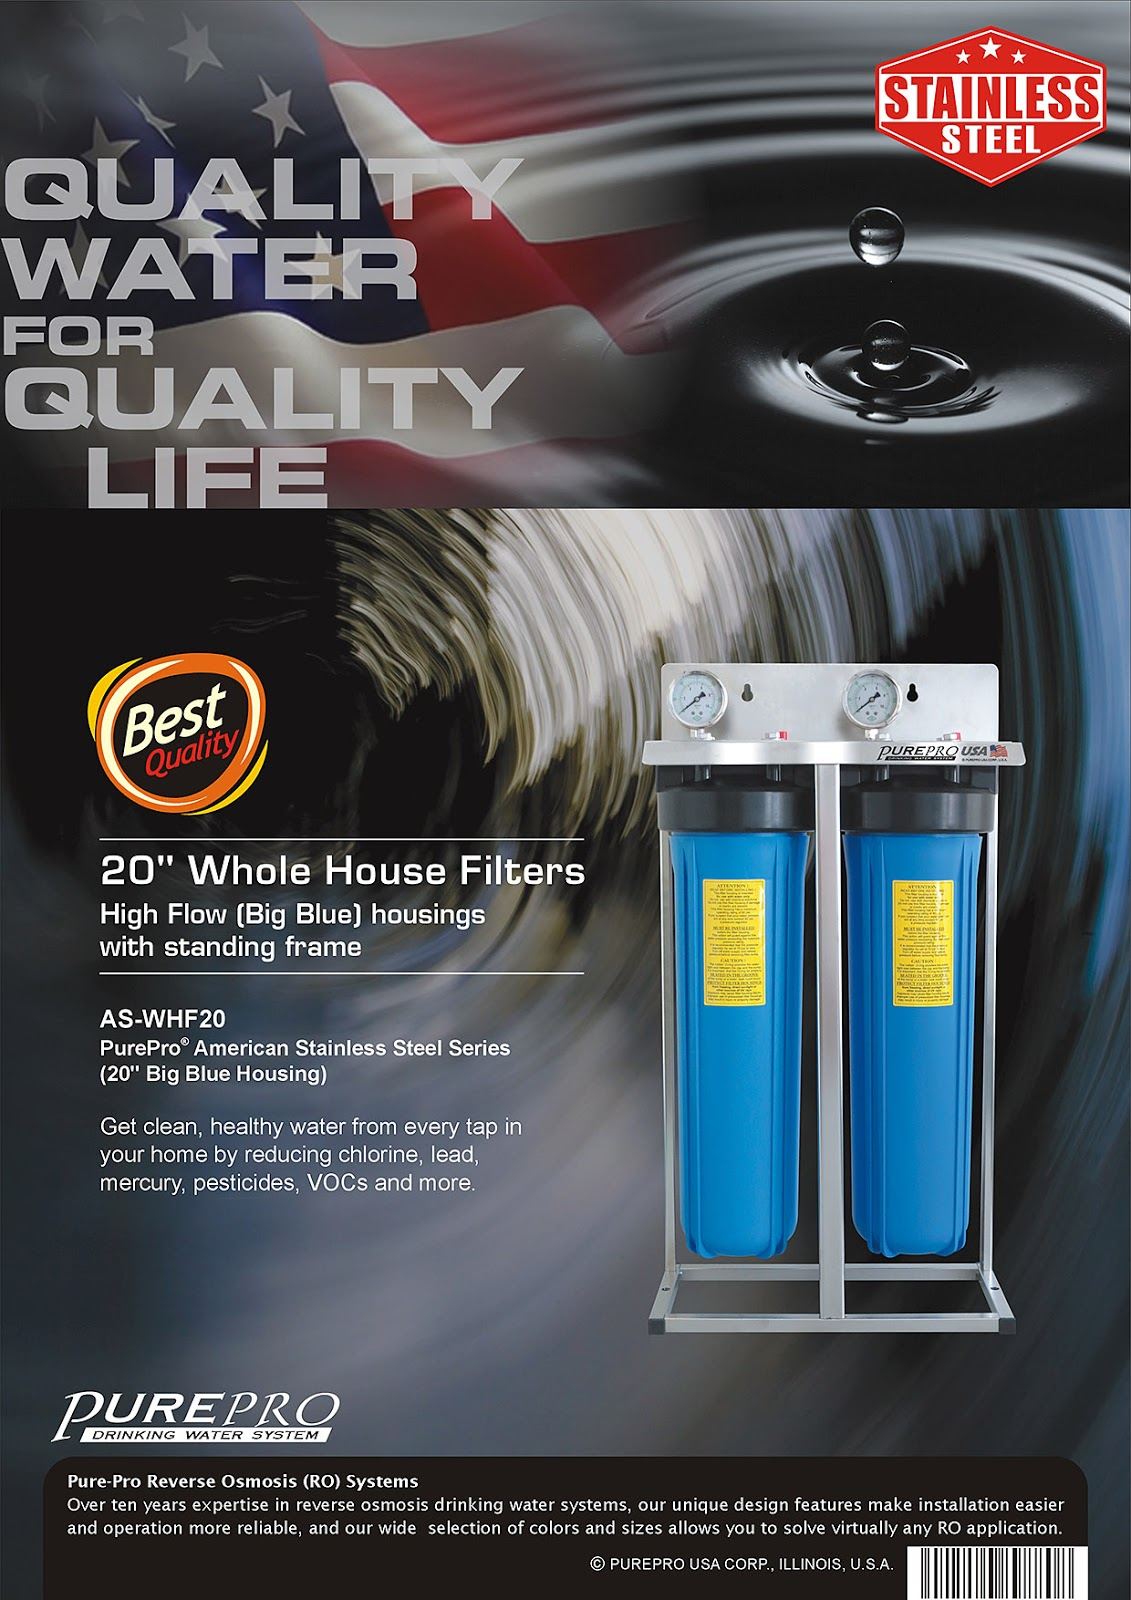 "PurePro® American Stainless Steel Series (20"" Big Blue Housing) AS-WHF20"